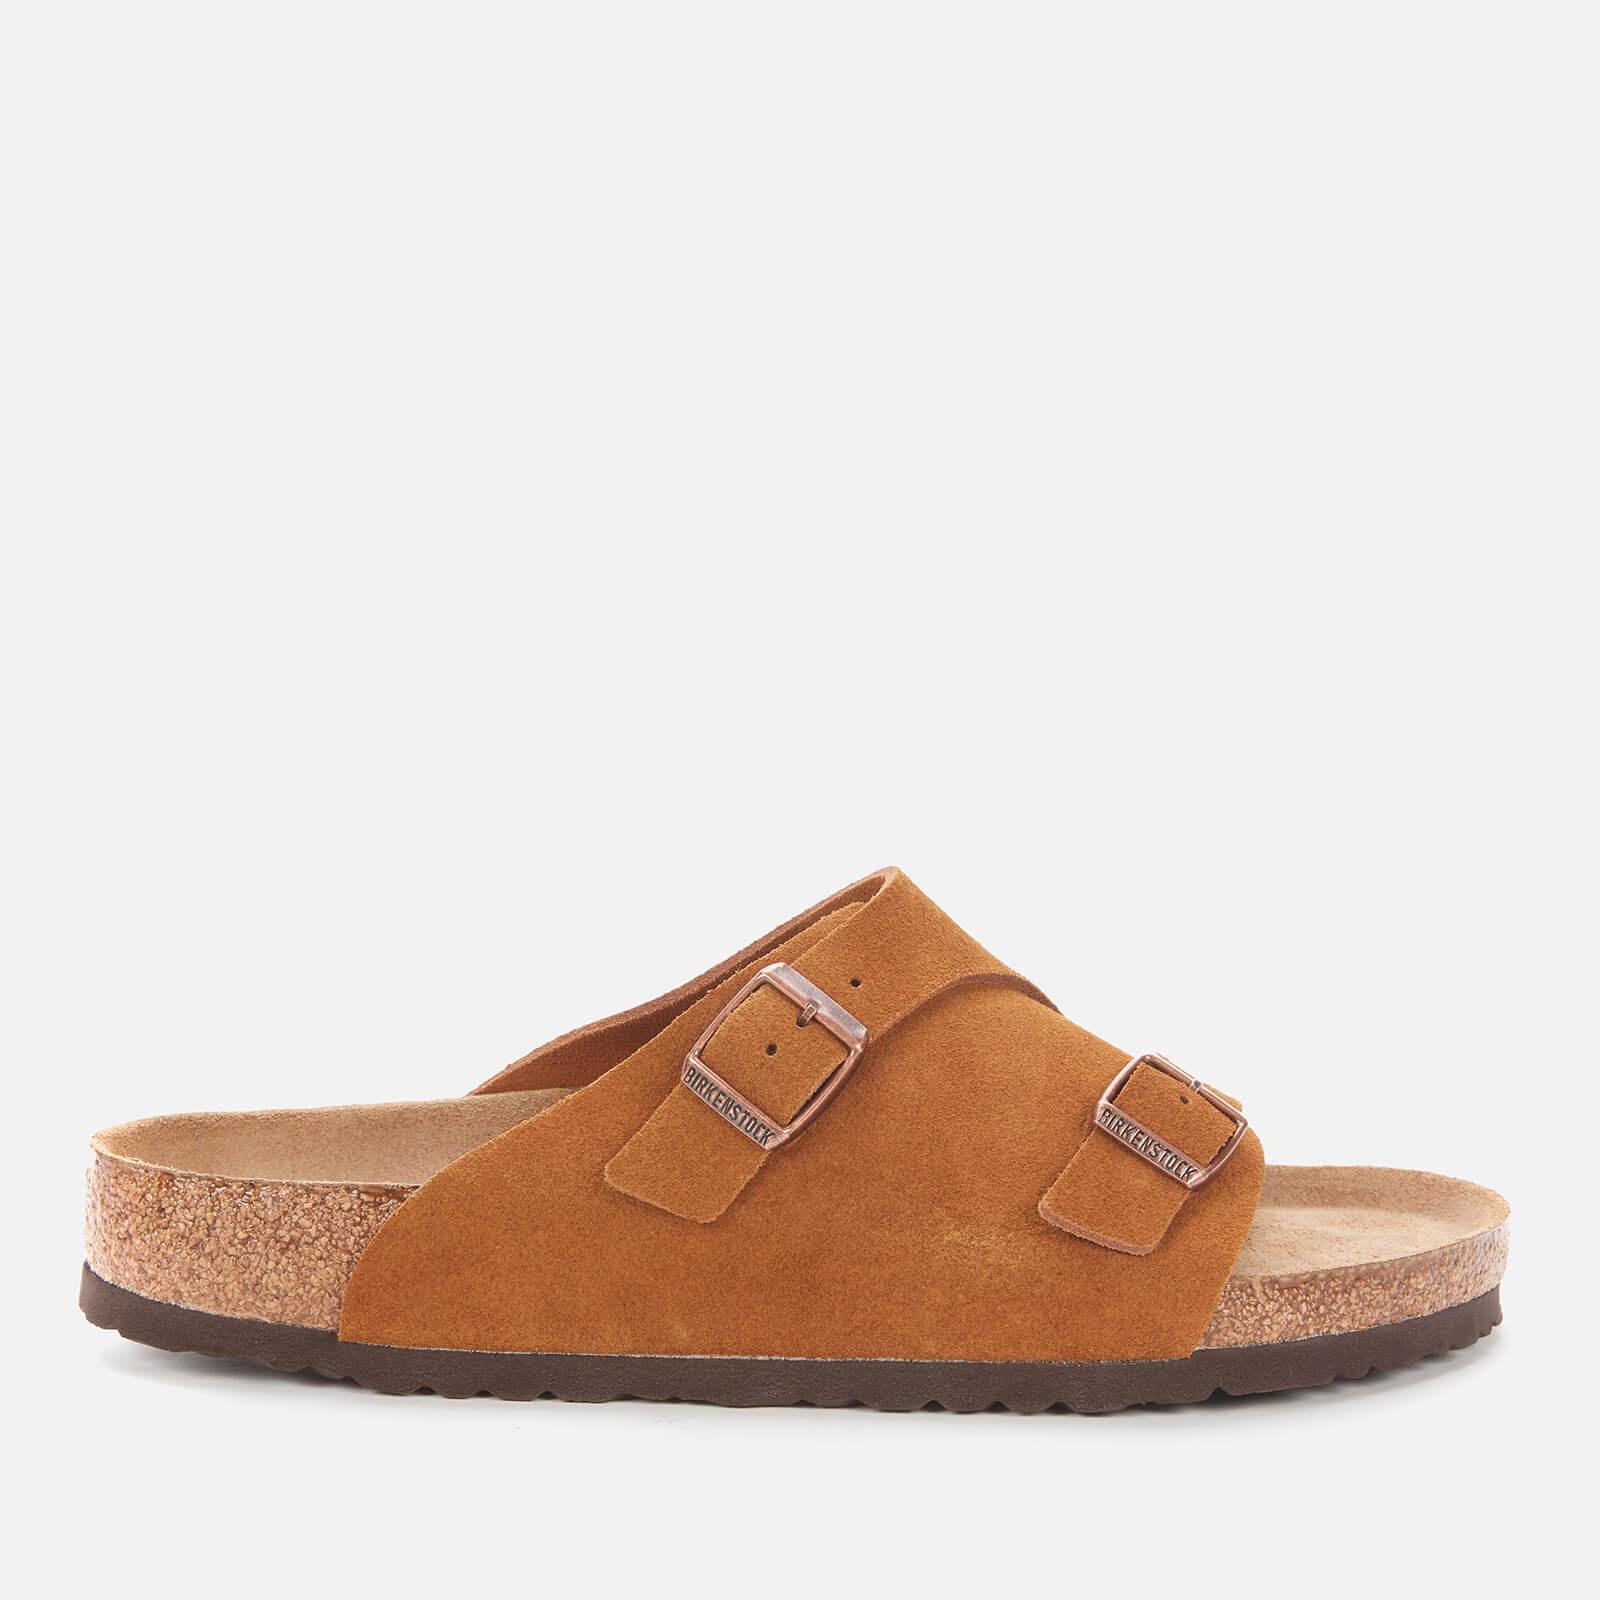 Birkenstock Mens Zurich Sfb Suede Slide Sandals Mink Eu 42 Uk 8